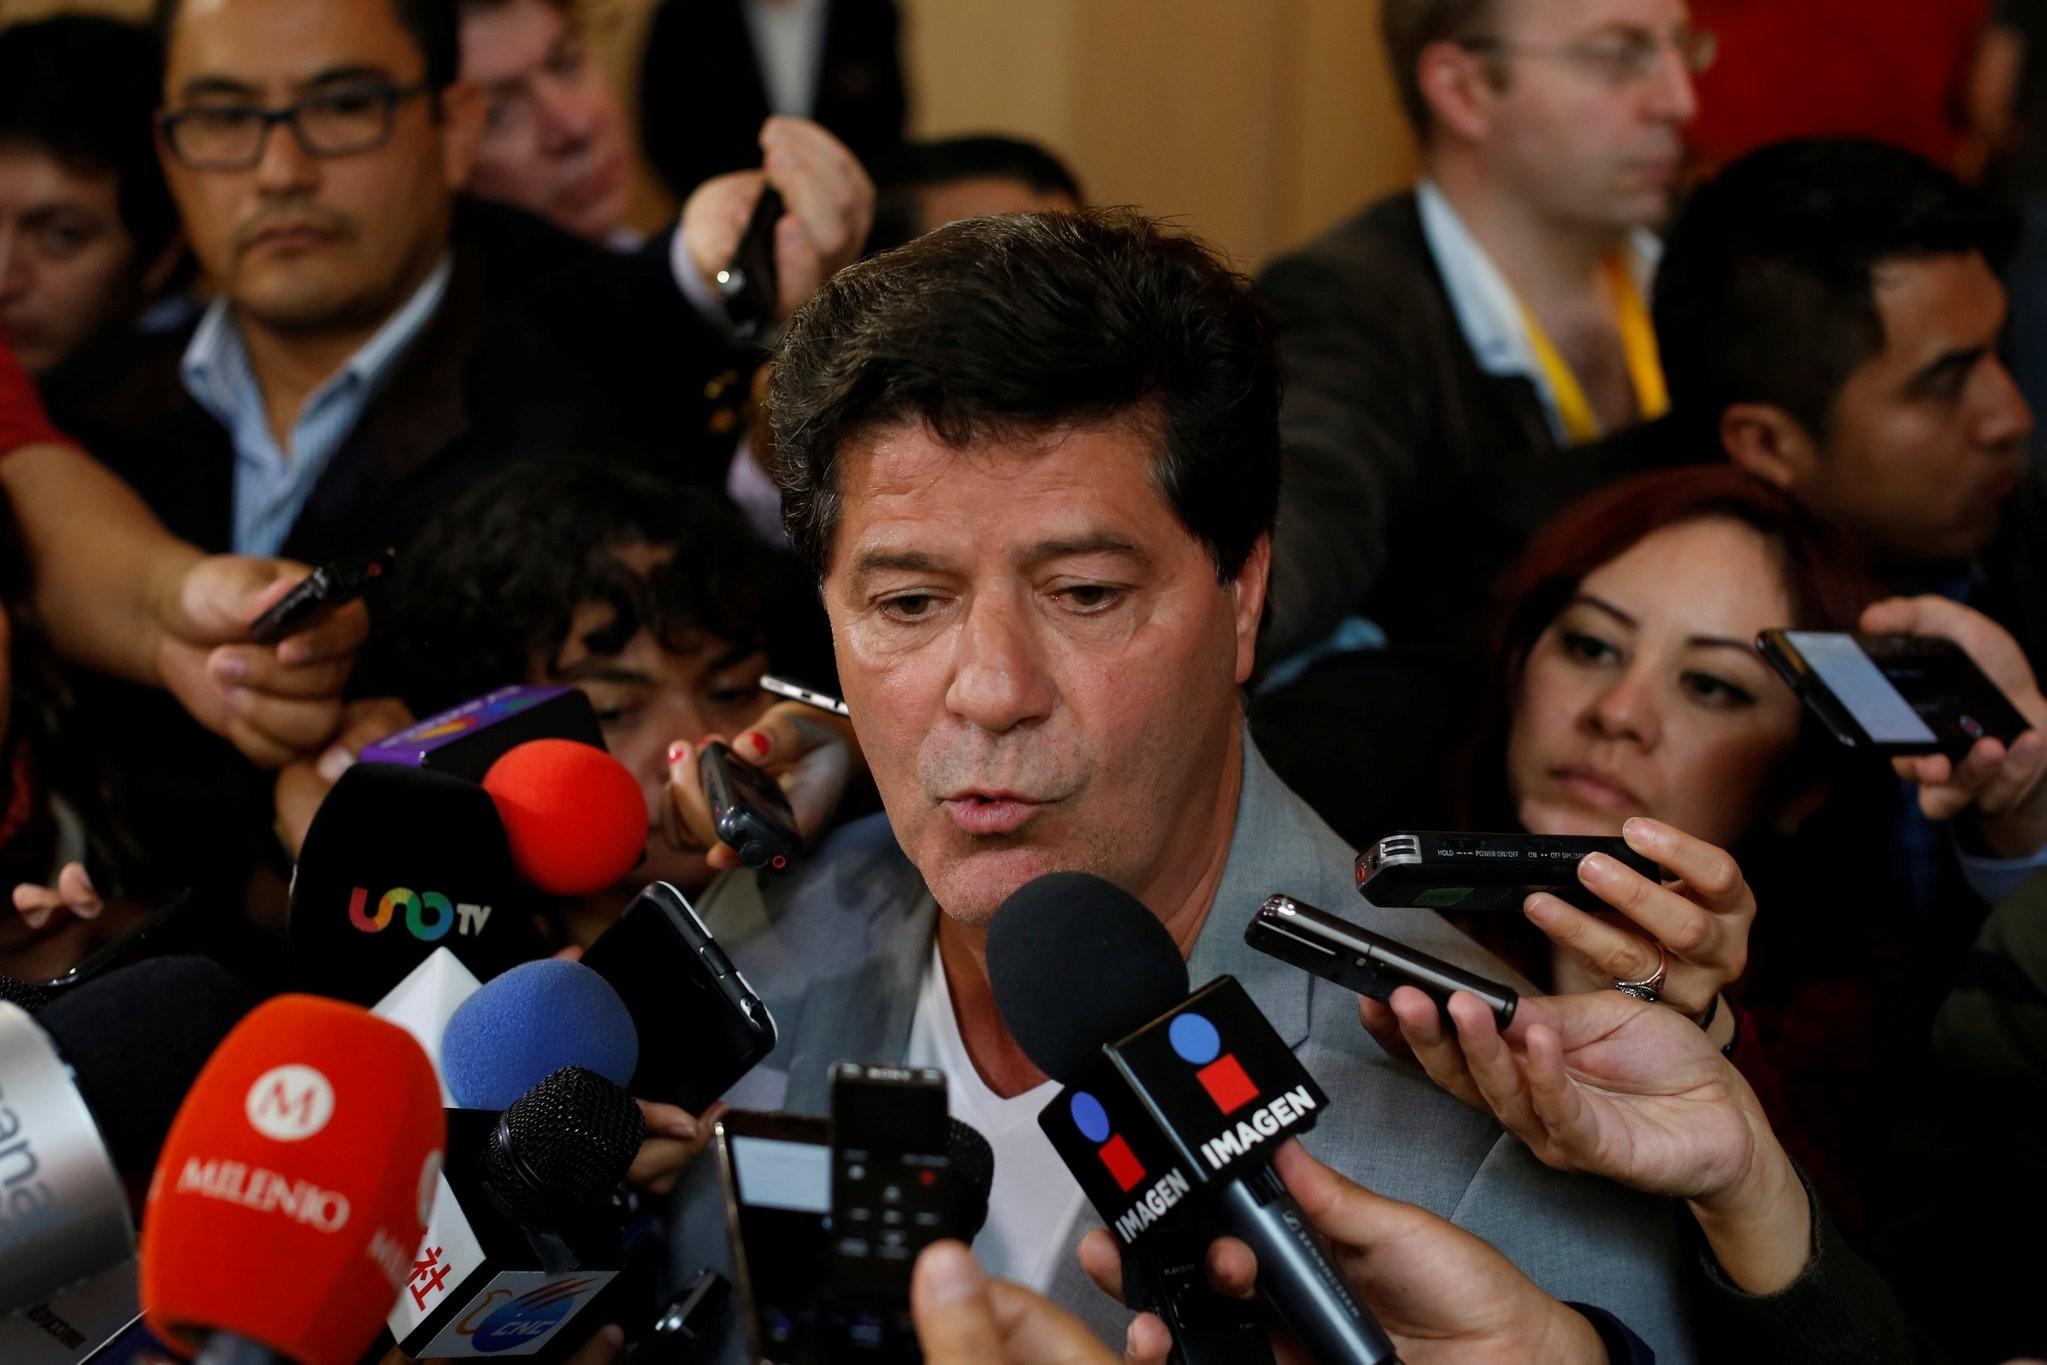 Jerry Dias, national president of Canadian union Unifor